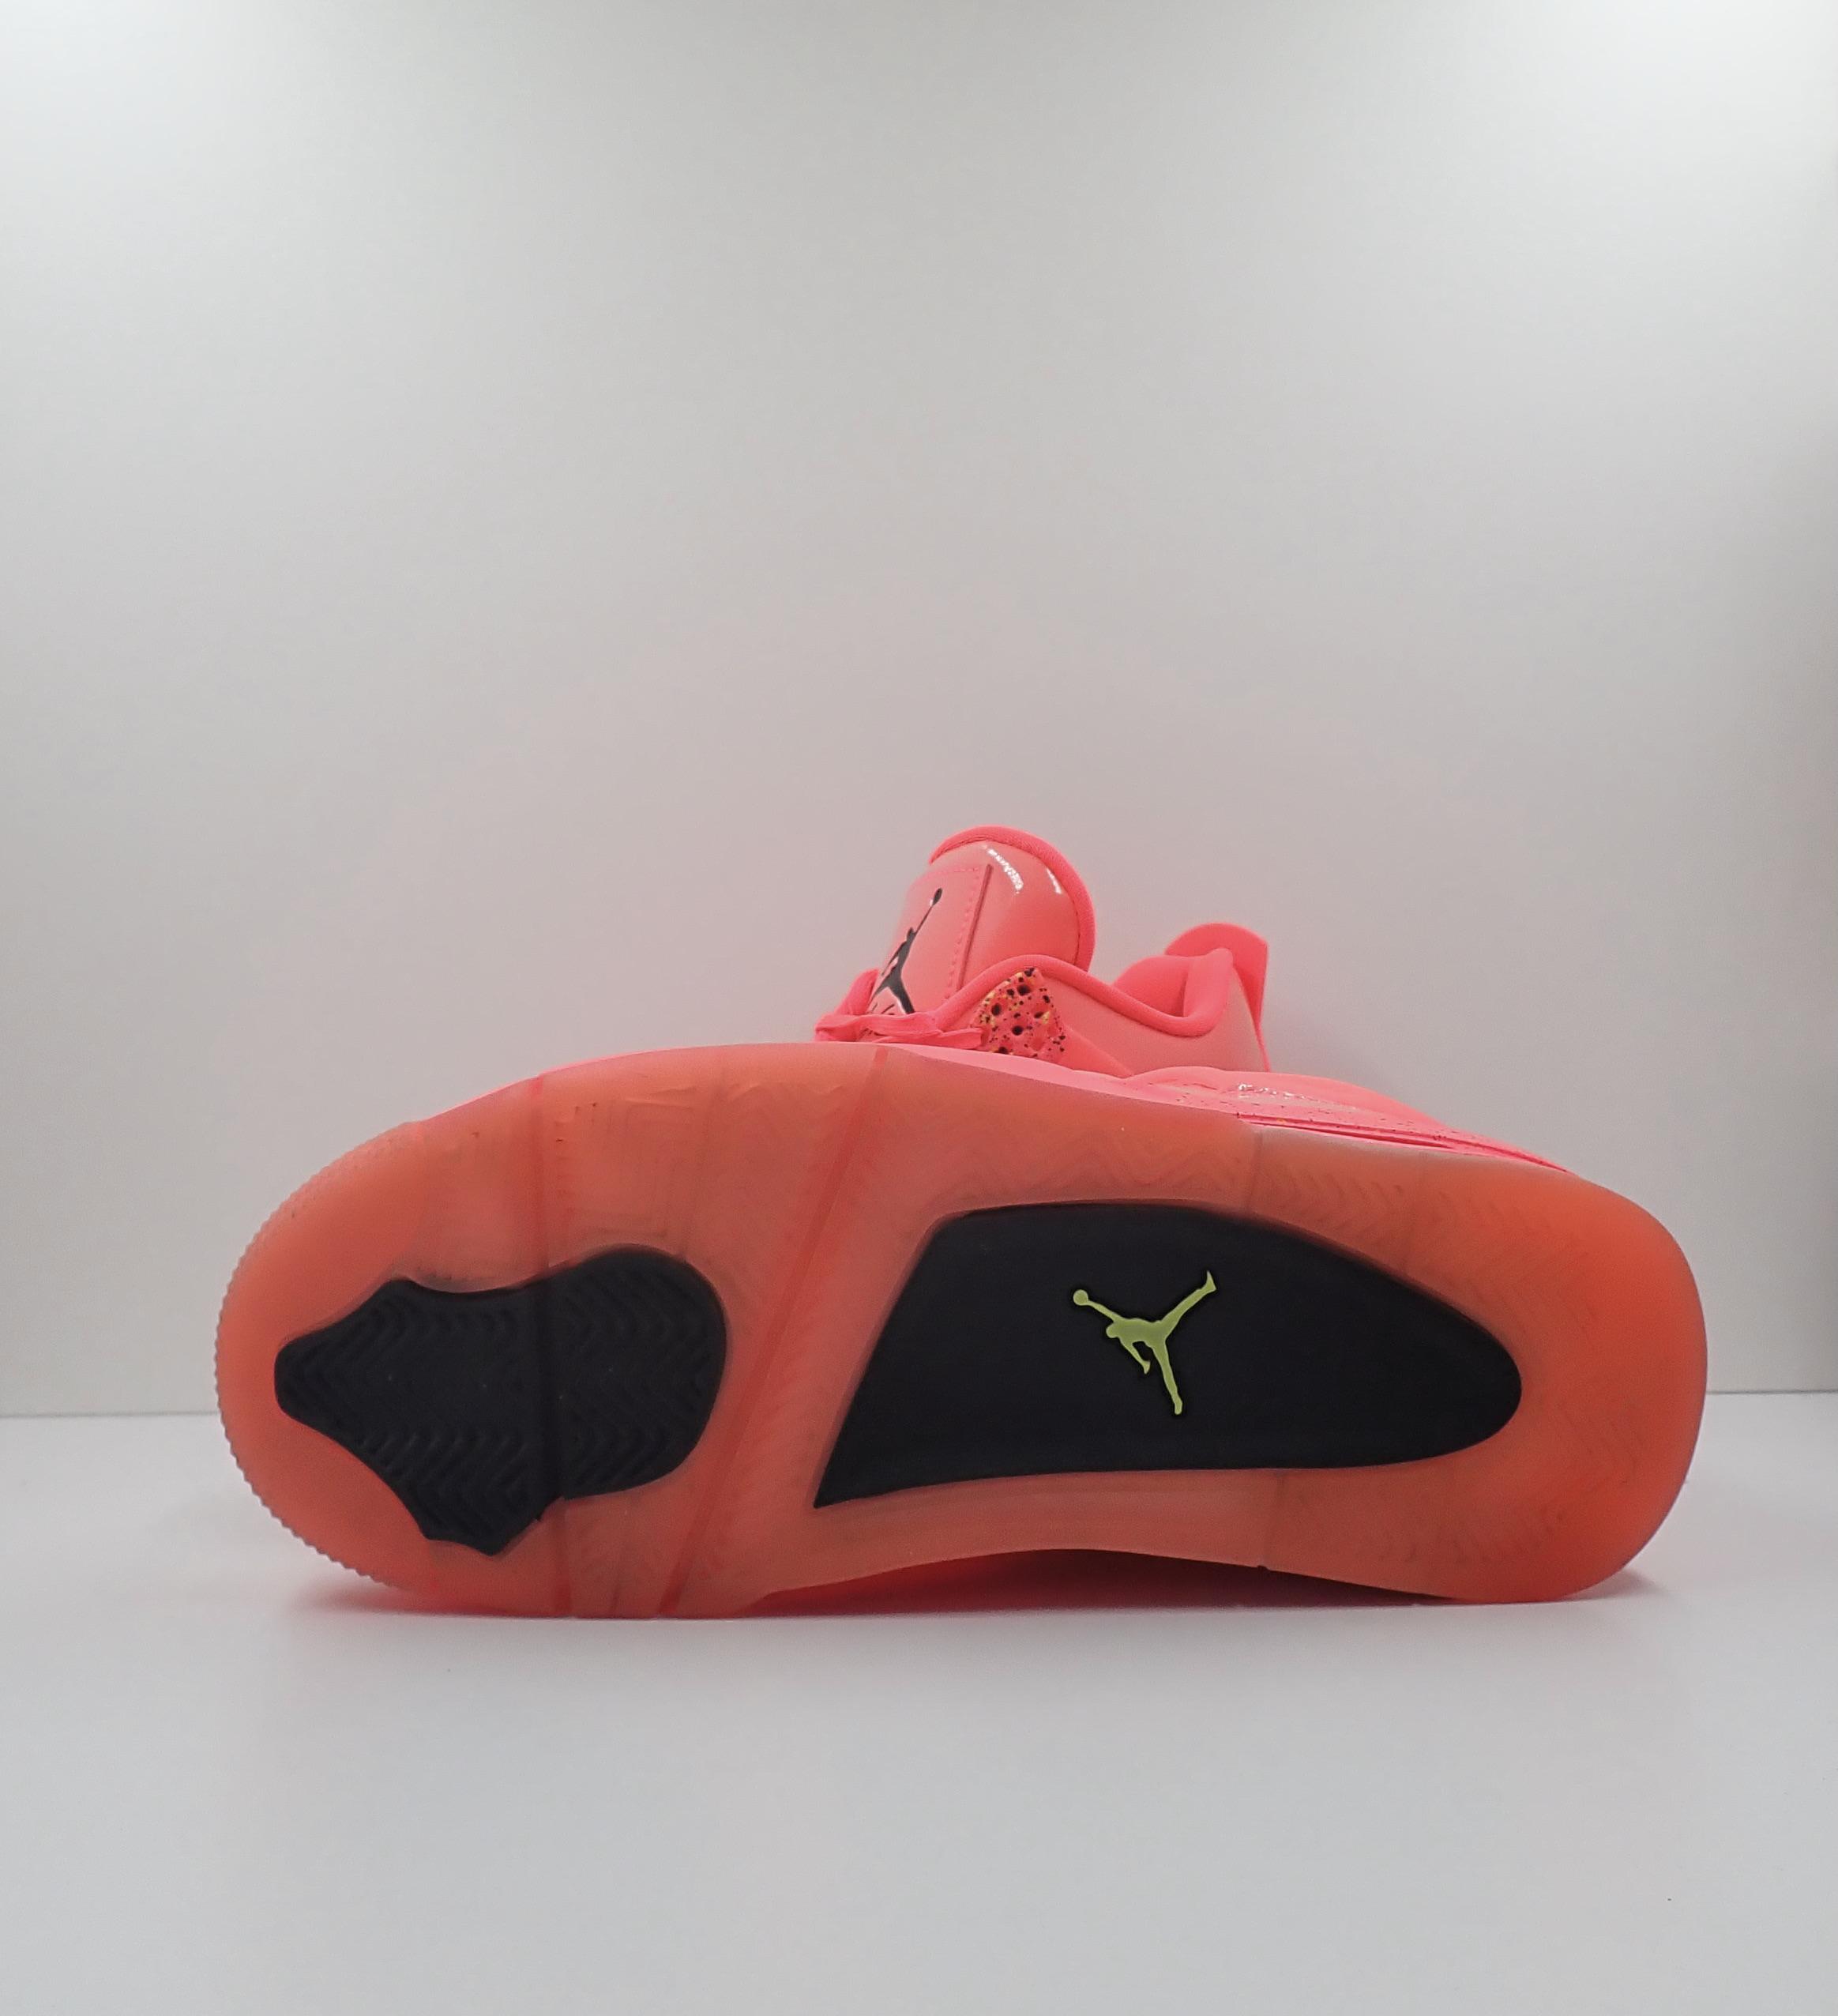 Jordan 4 NRG Hot Punch (W)